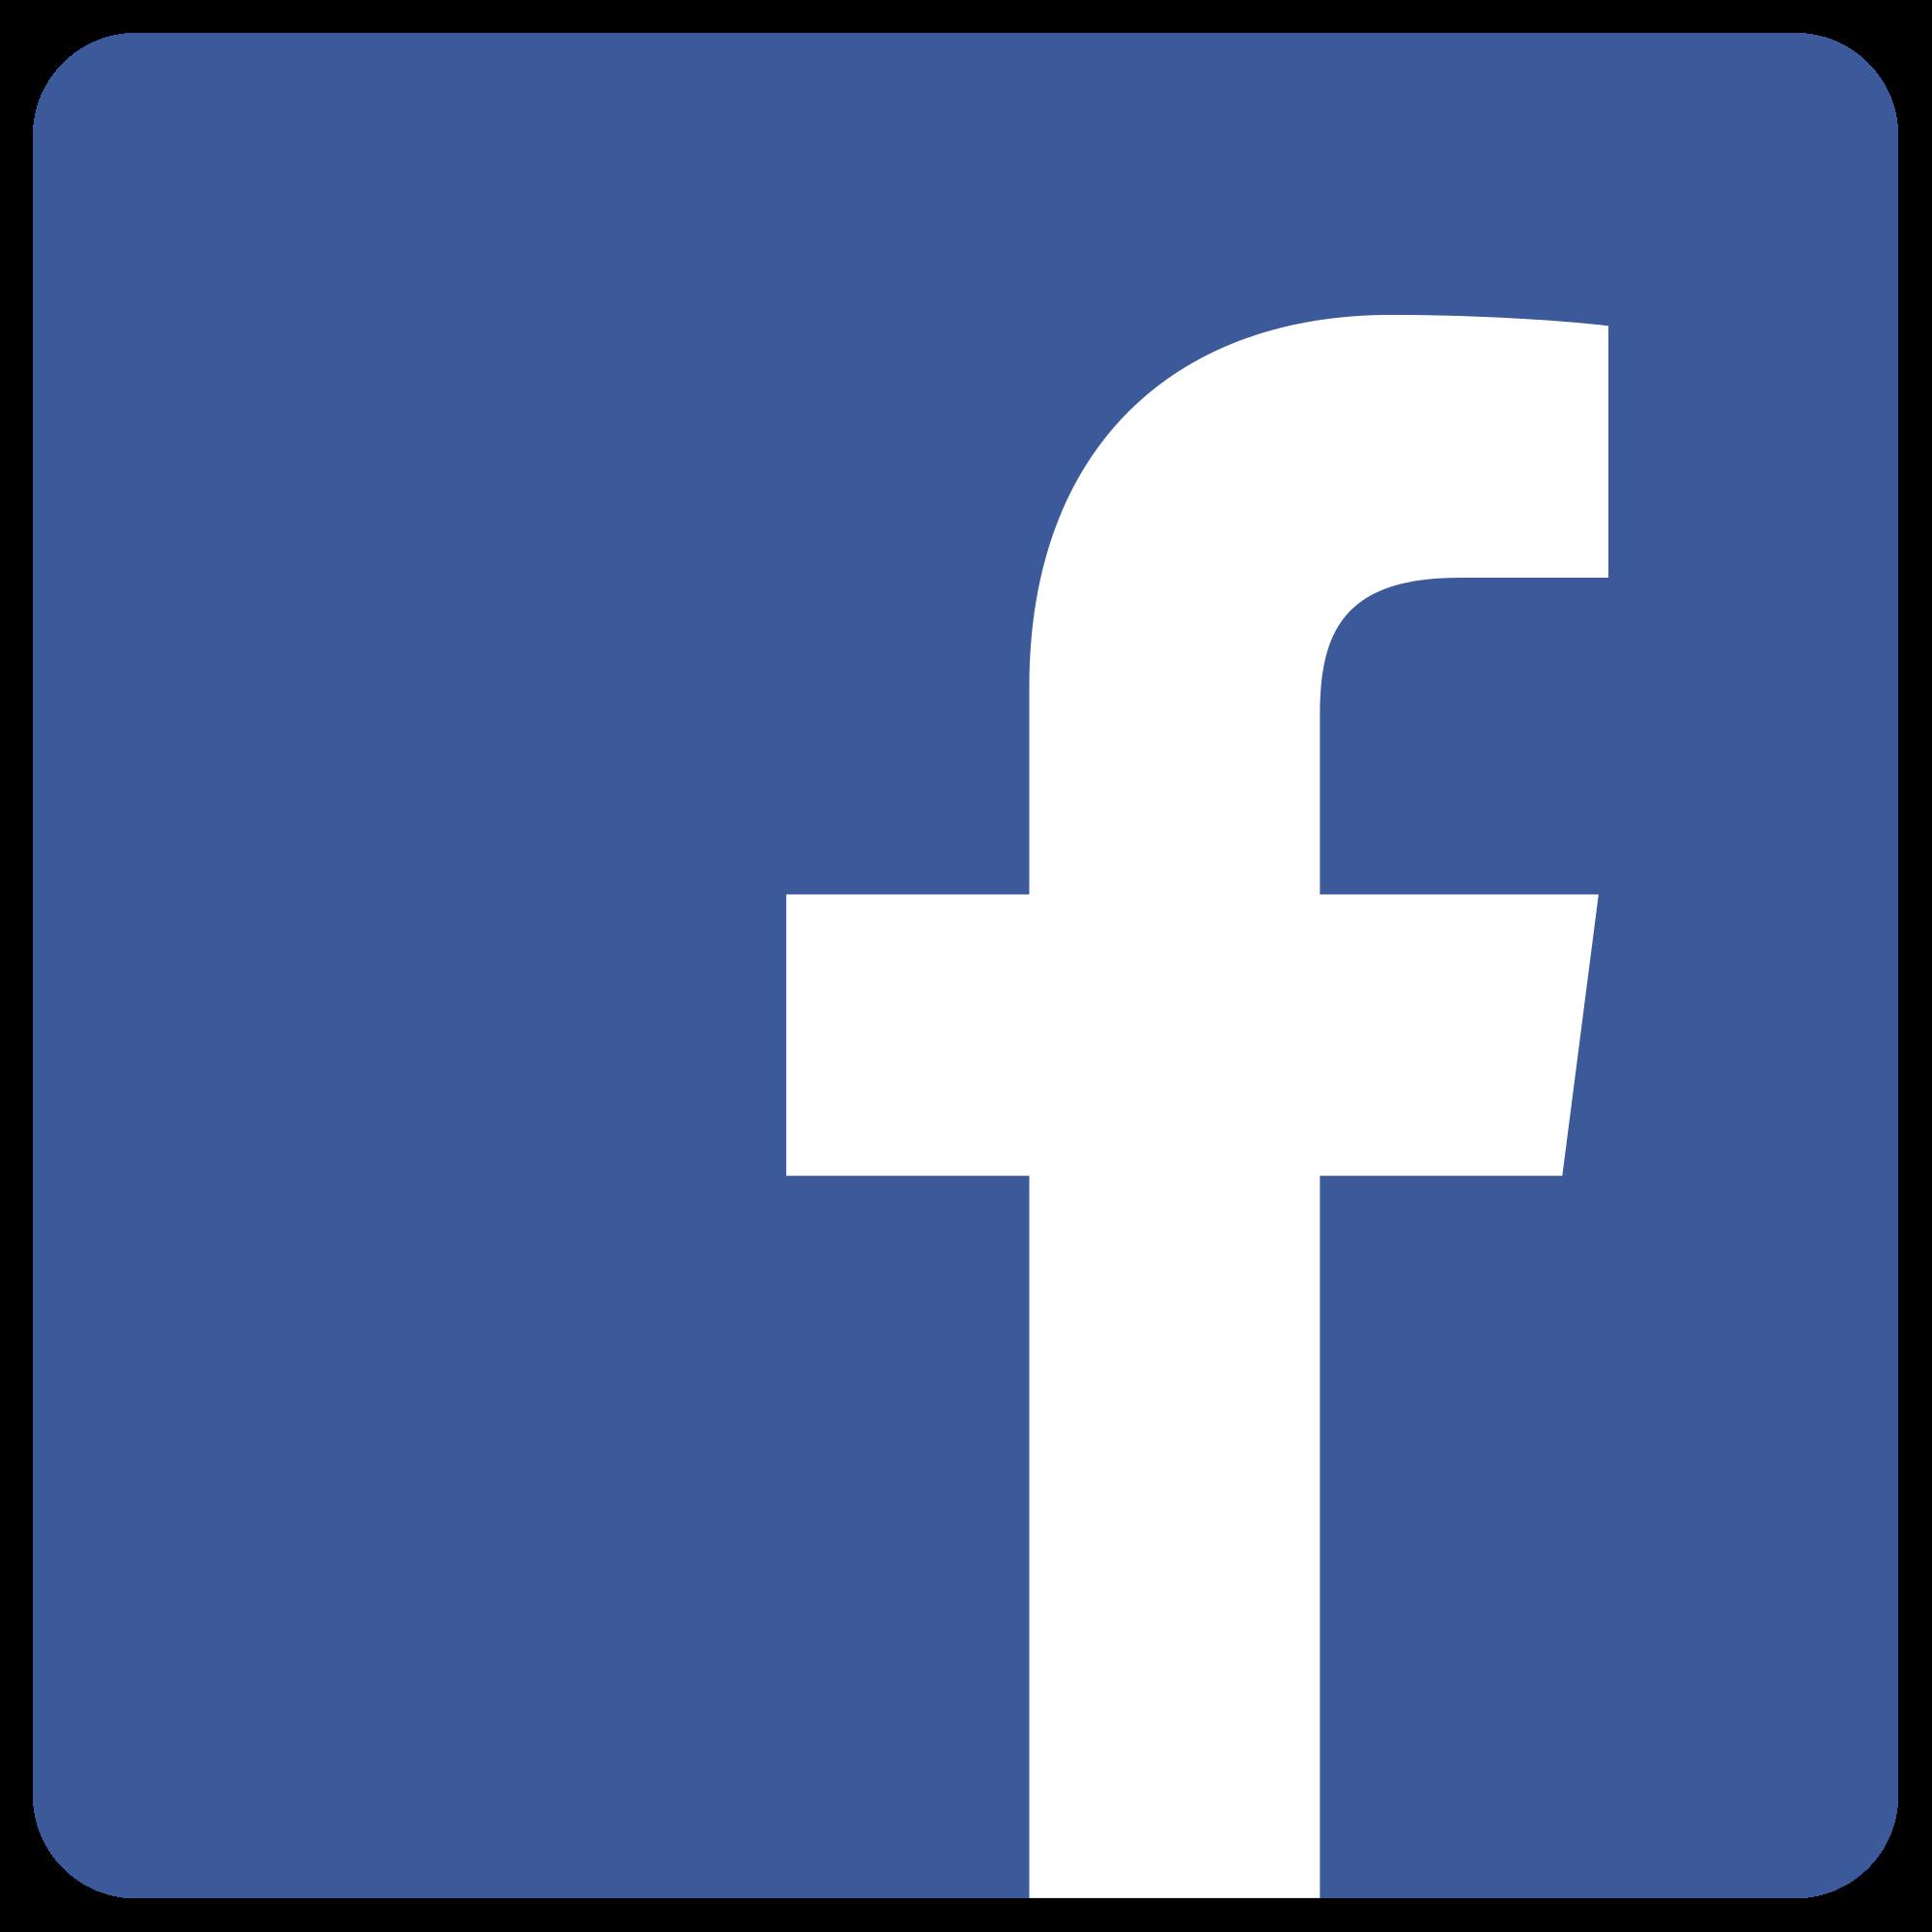 Jsme i na facebooku